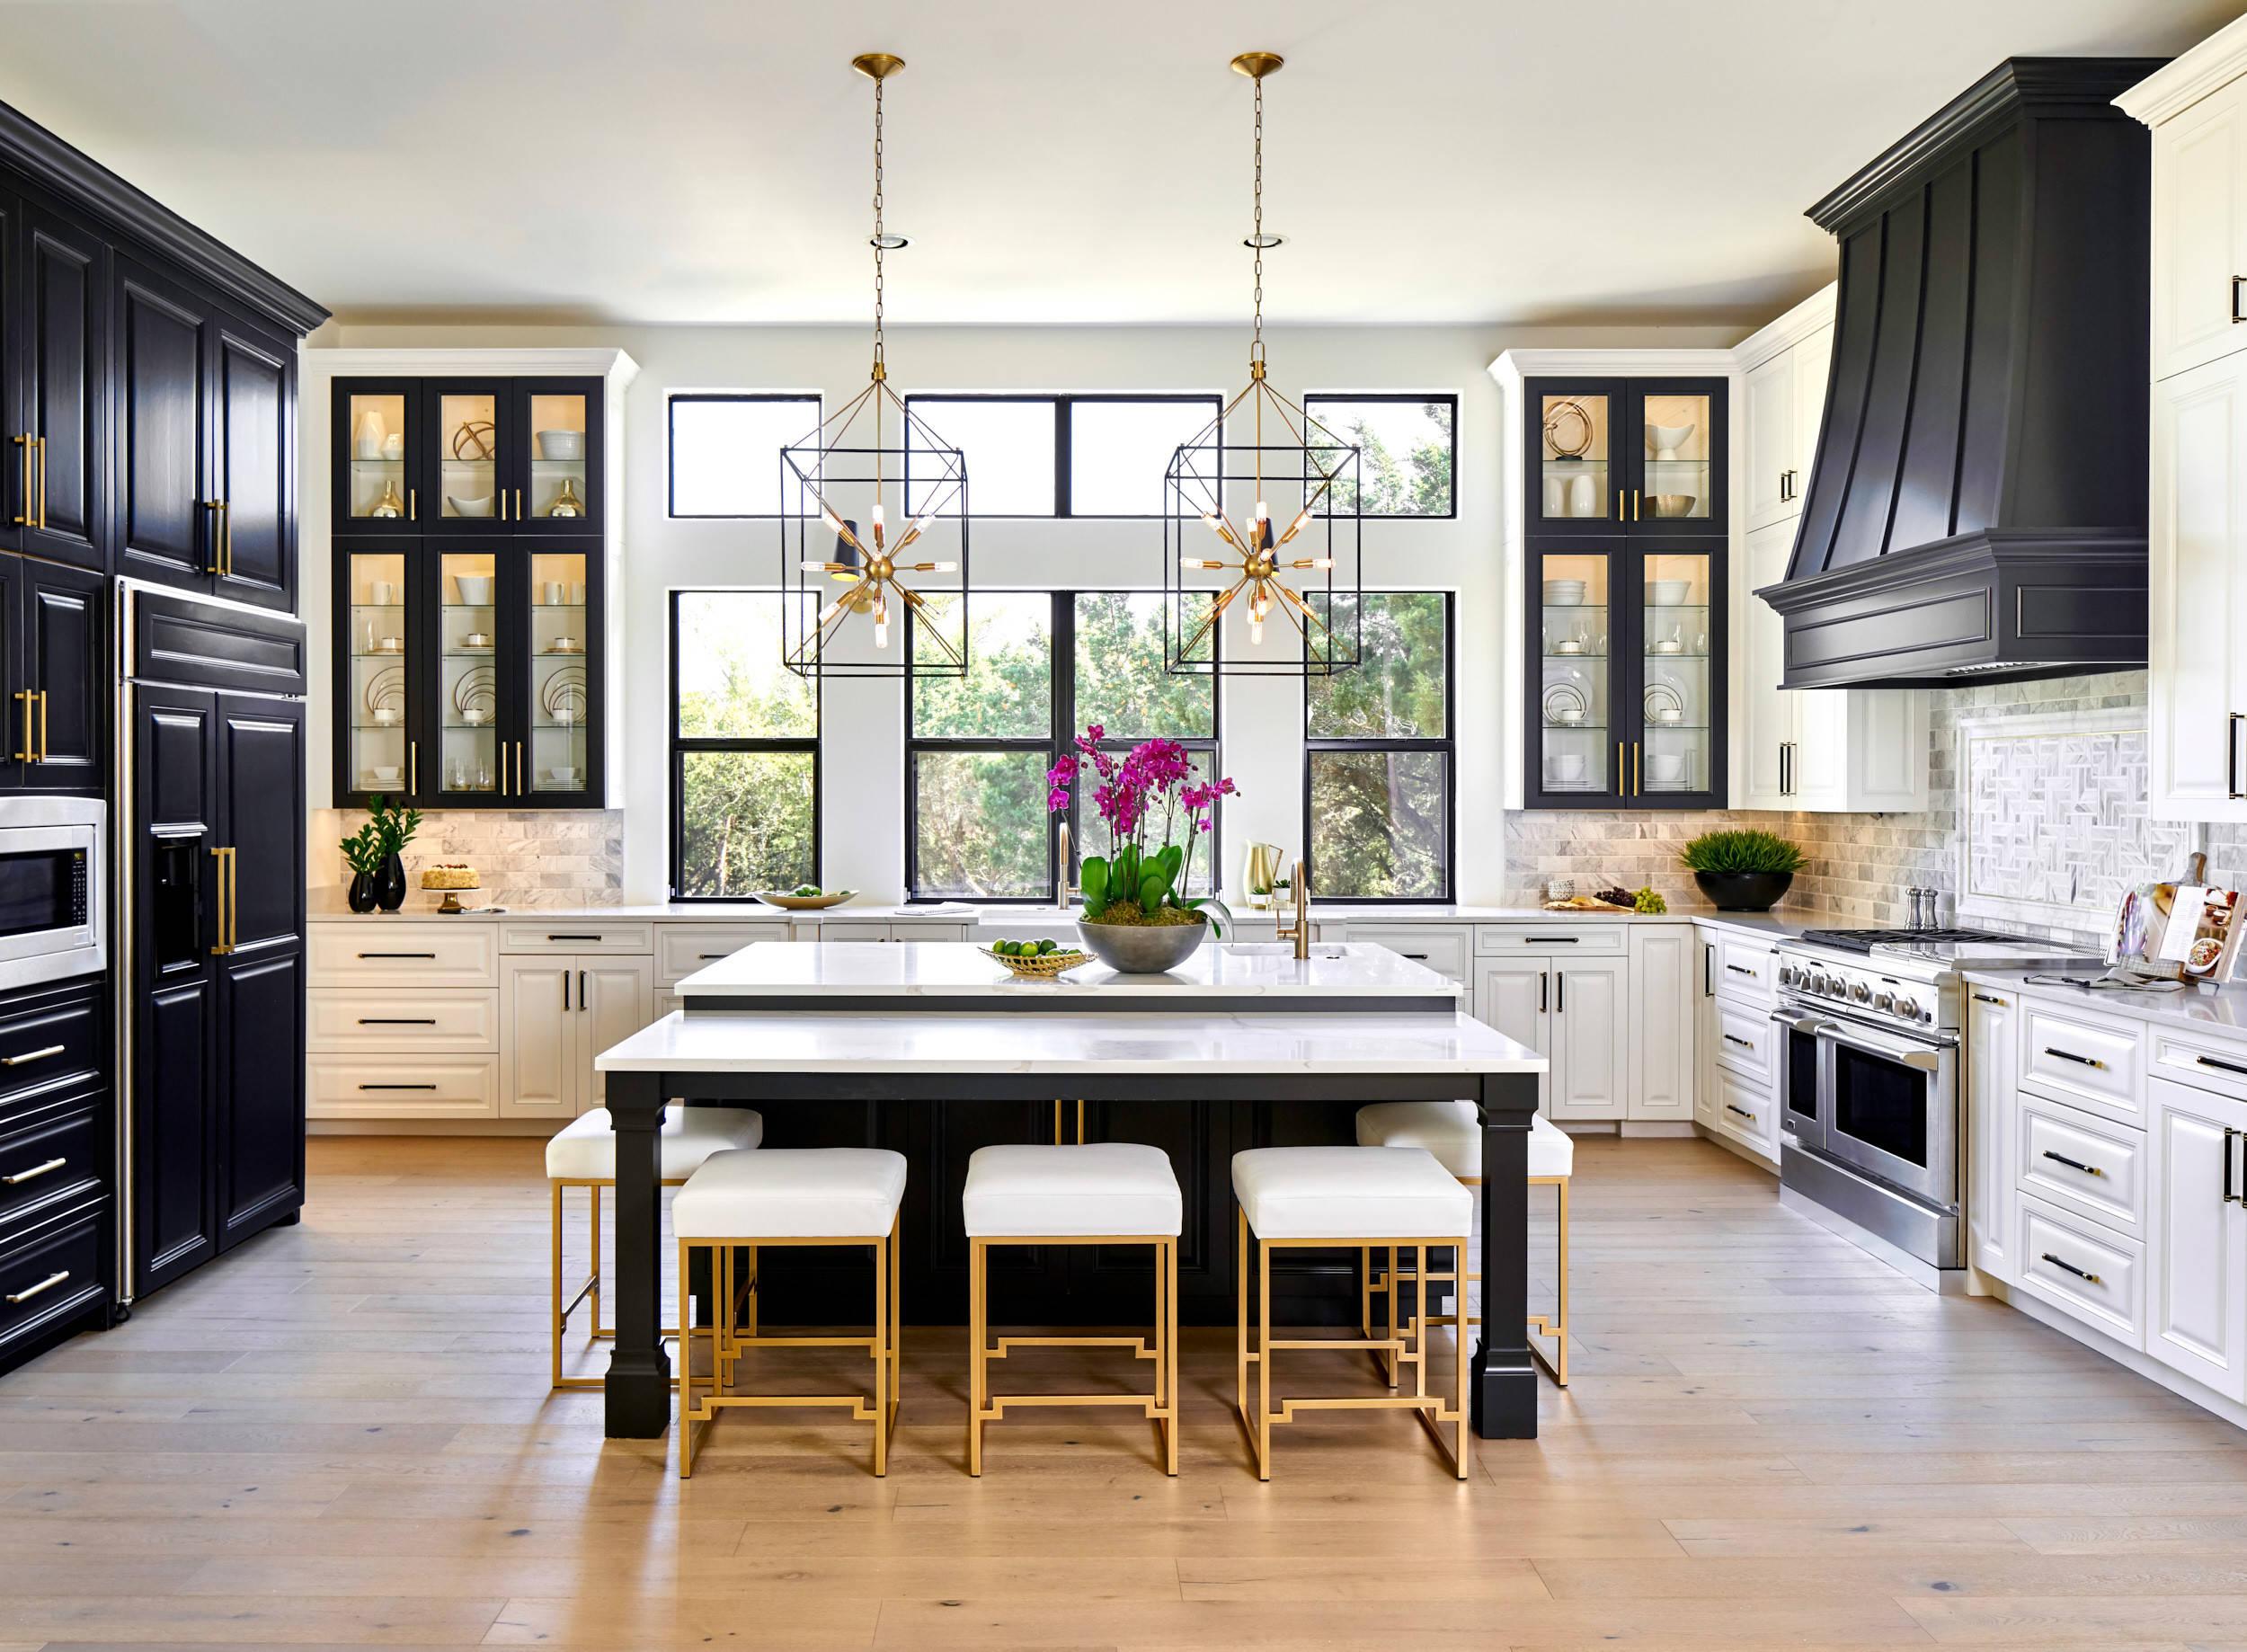 Image of: Cream And Black Kitchen Ideas Photos Houzz